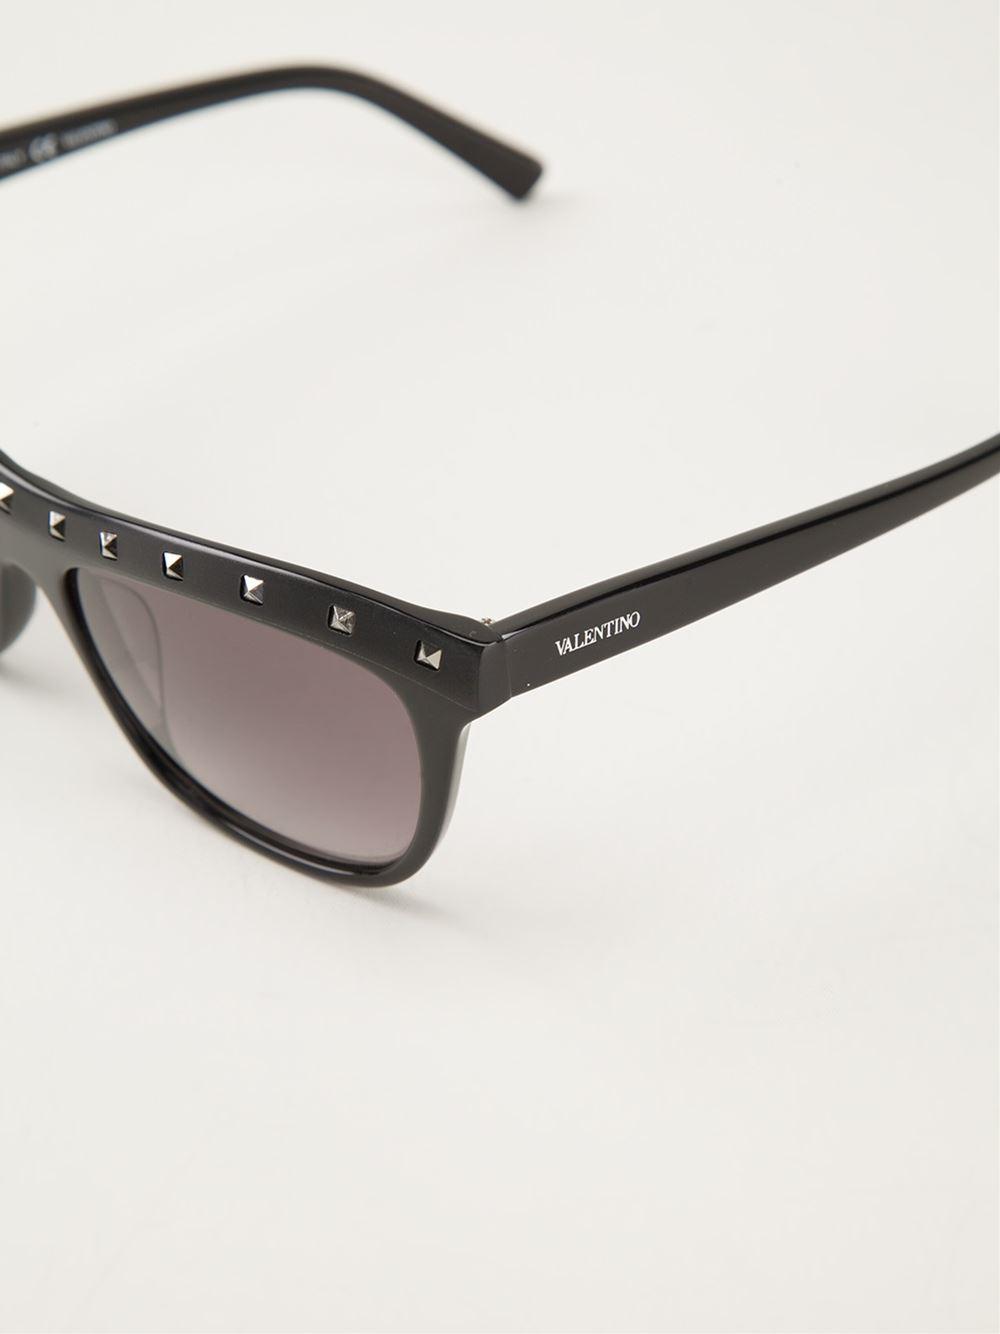 Valentino 'rockstud' Sunglasses - Liska - Farfetch.com